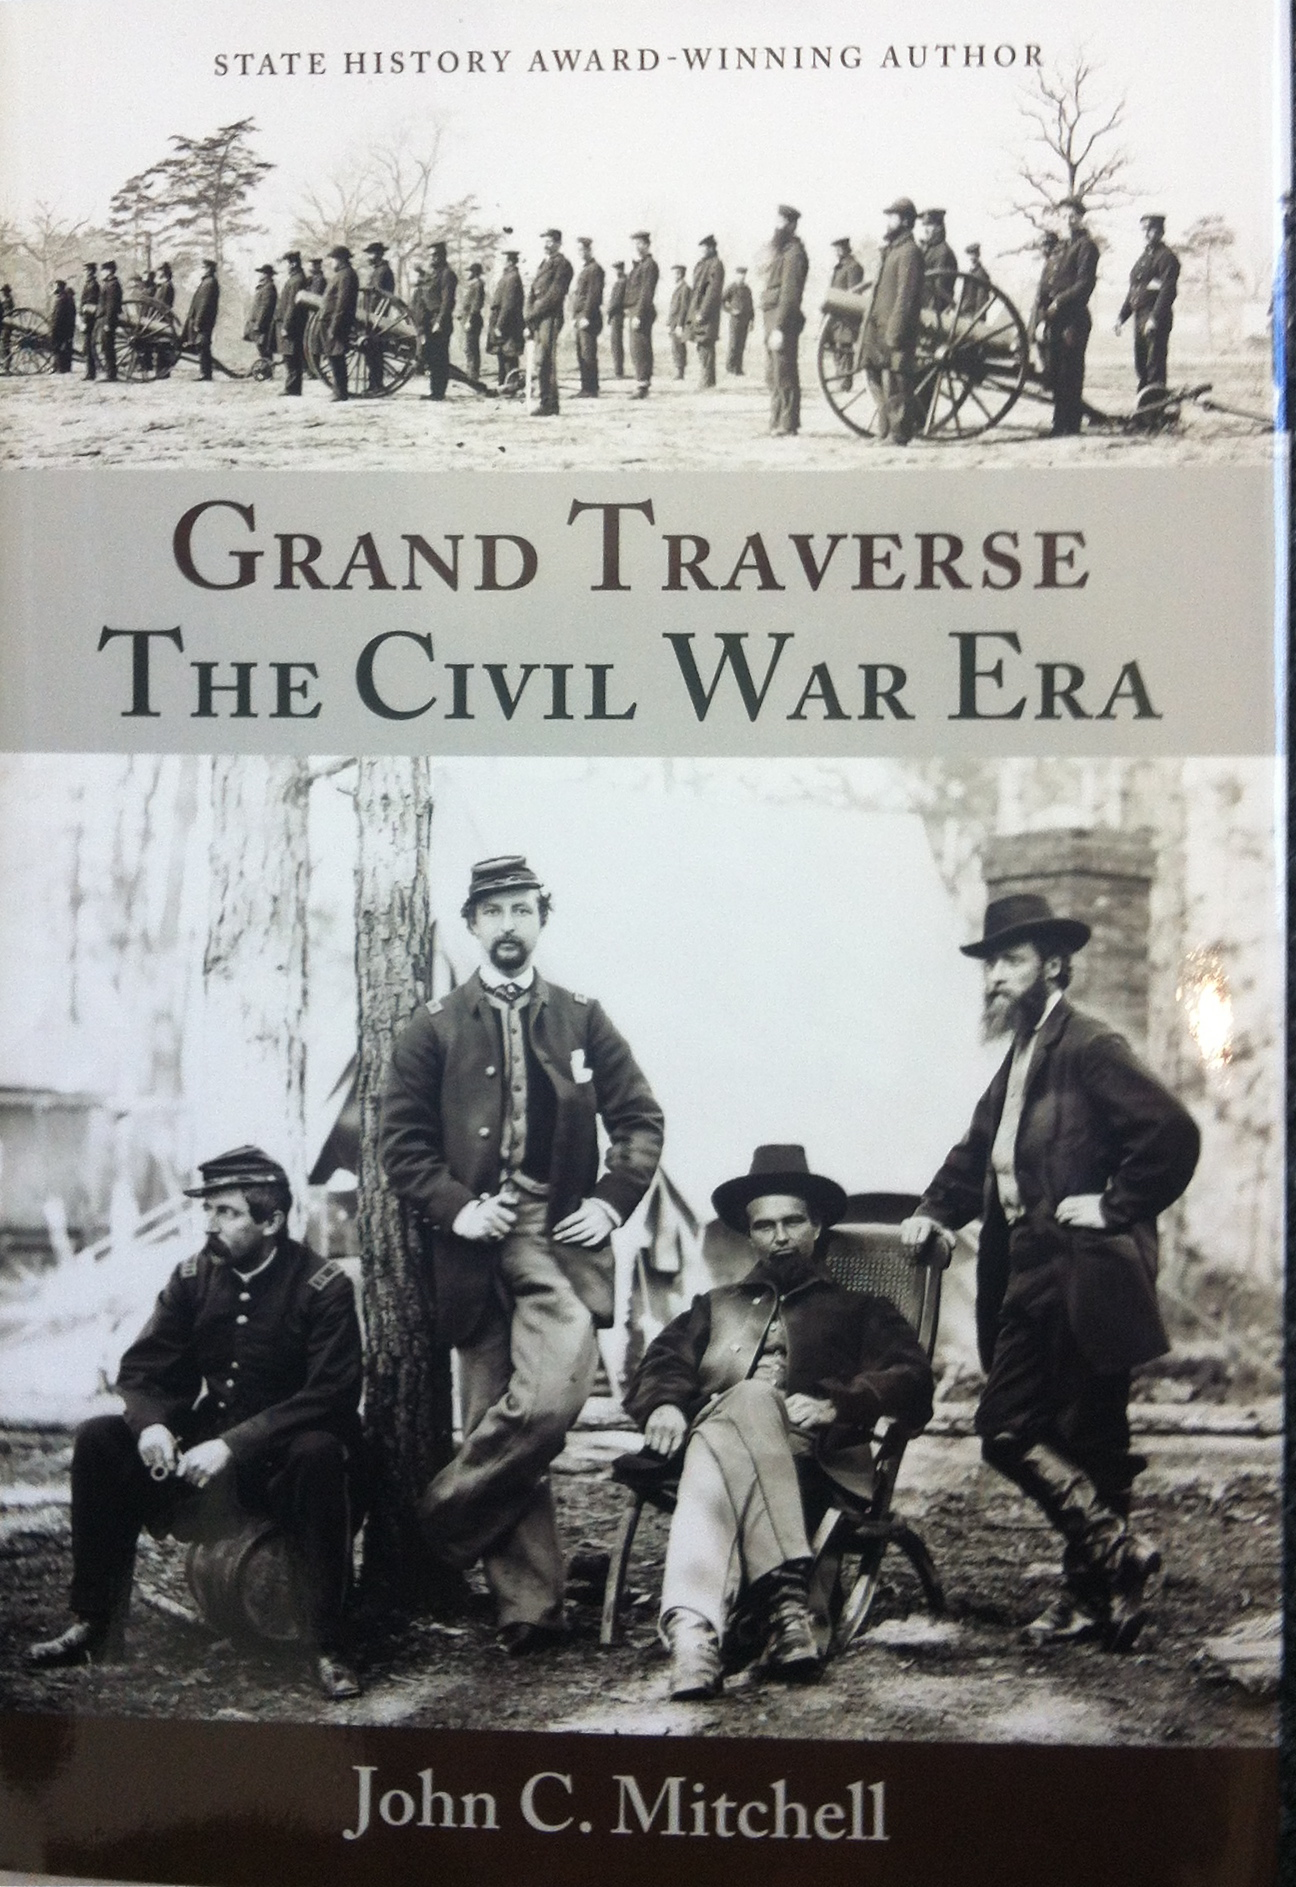 Grand Traverse The Civil War Era